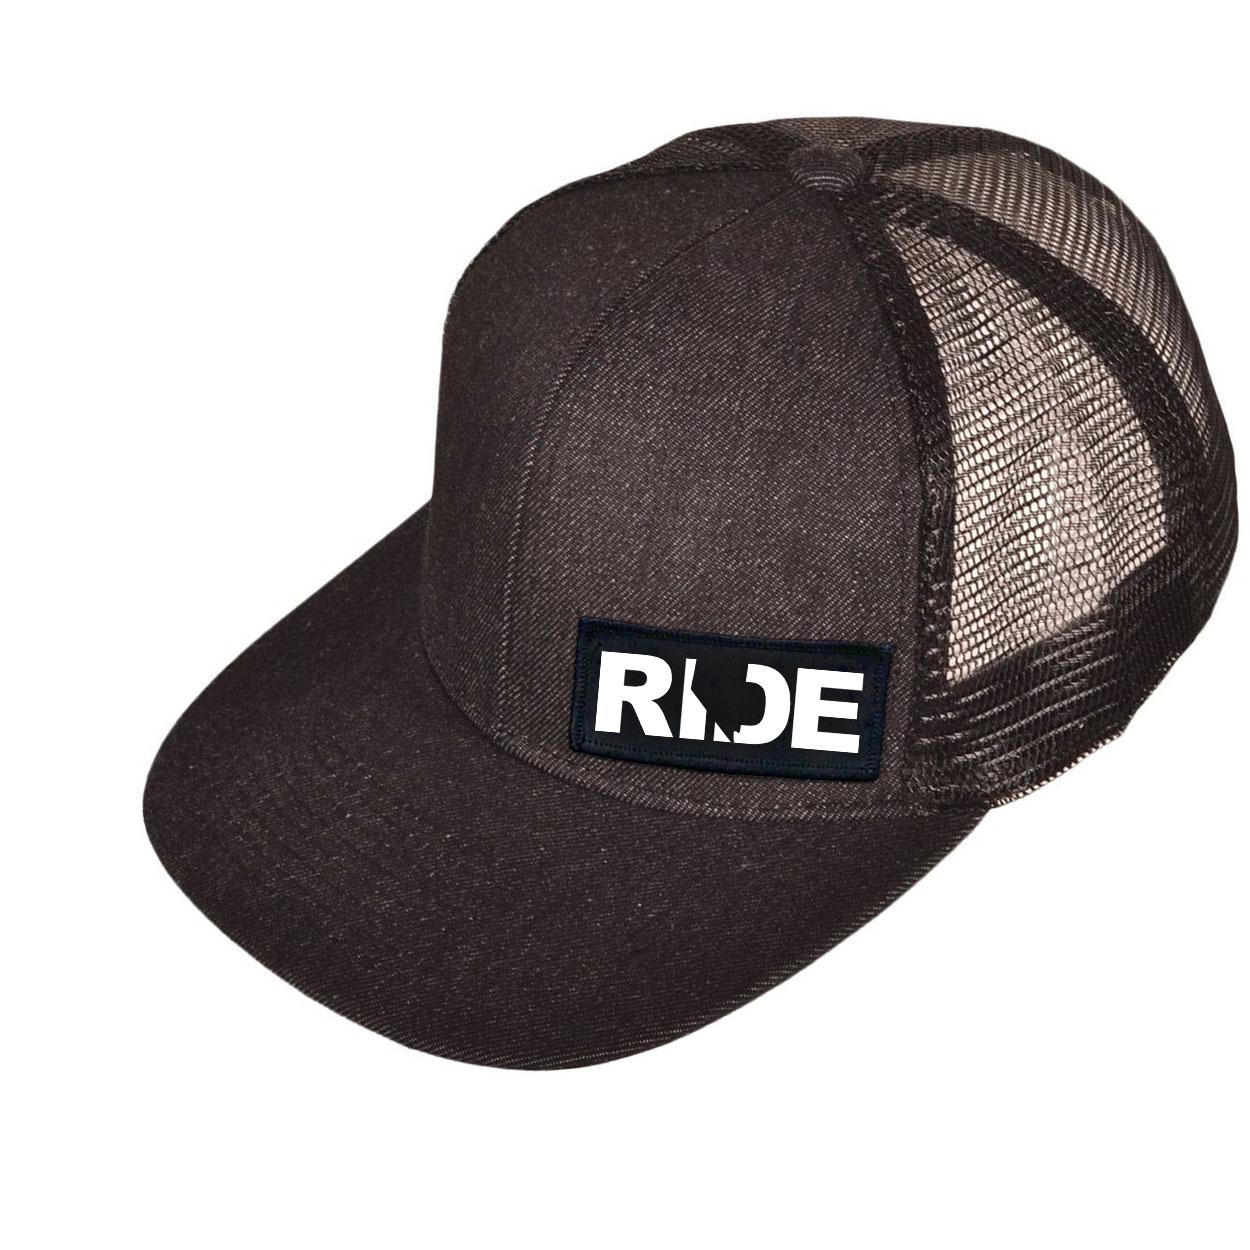 Ride Nevada Night Out Woven Patch Snapback Flat Brim Hat Black Denim (White Logo)